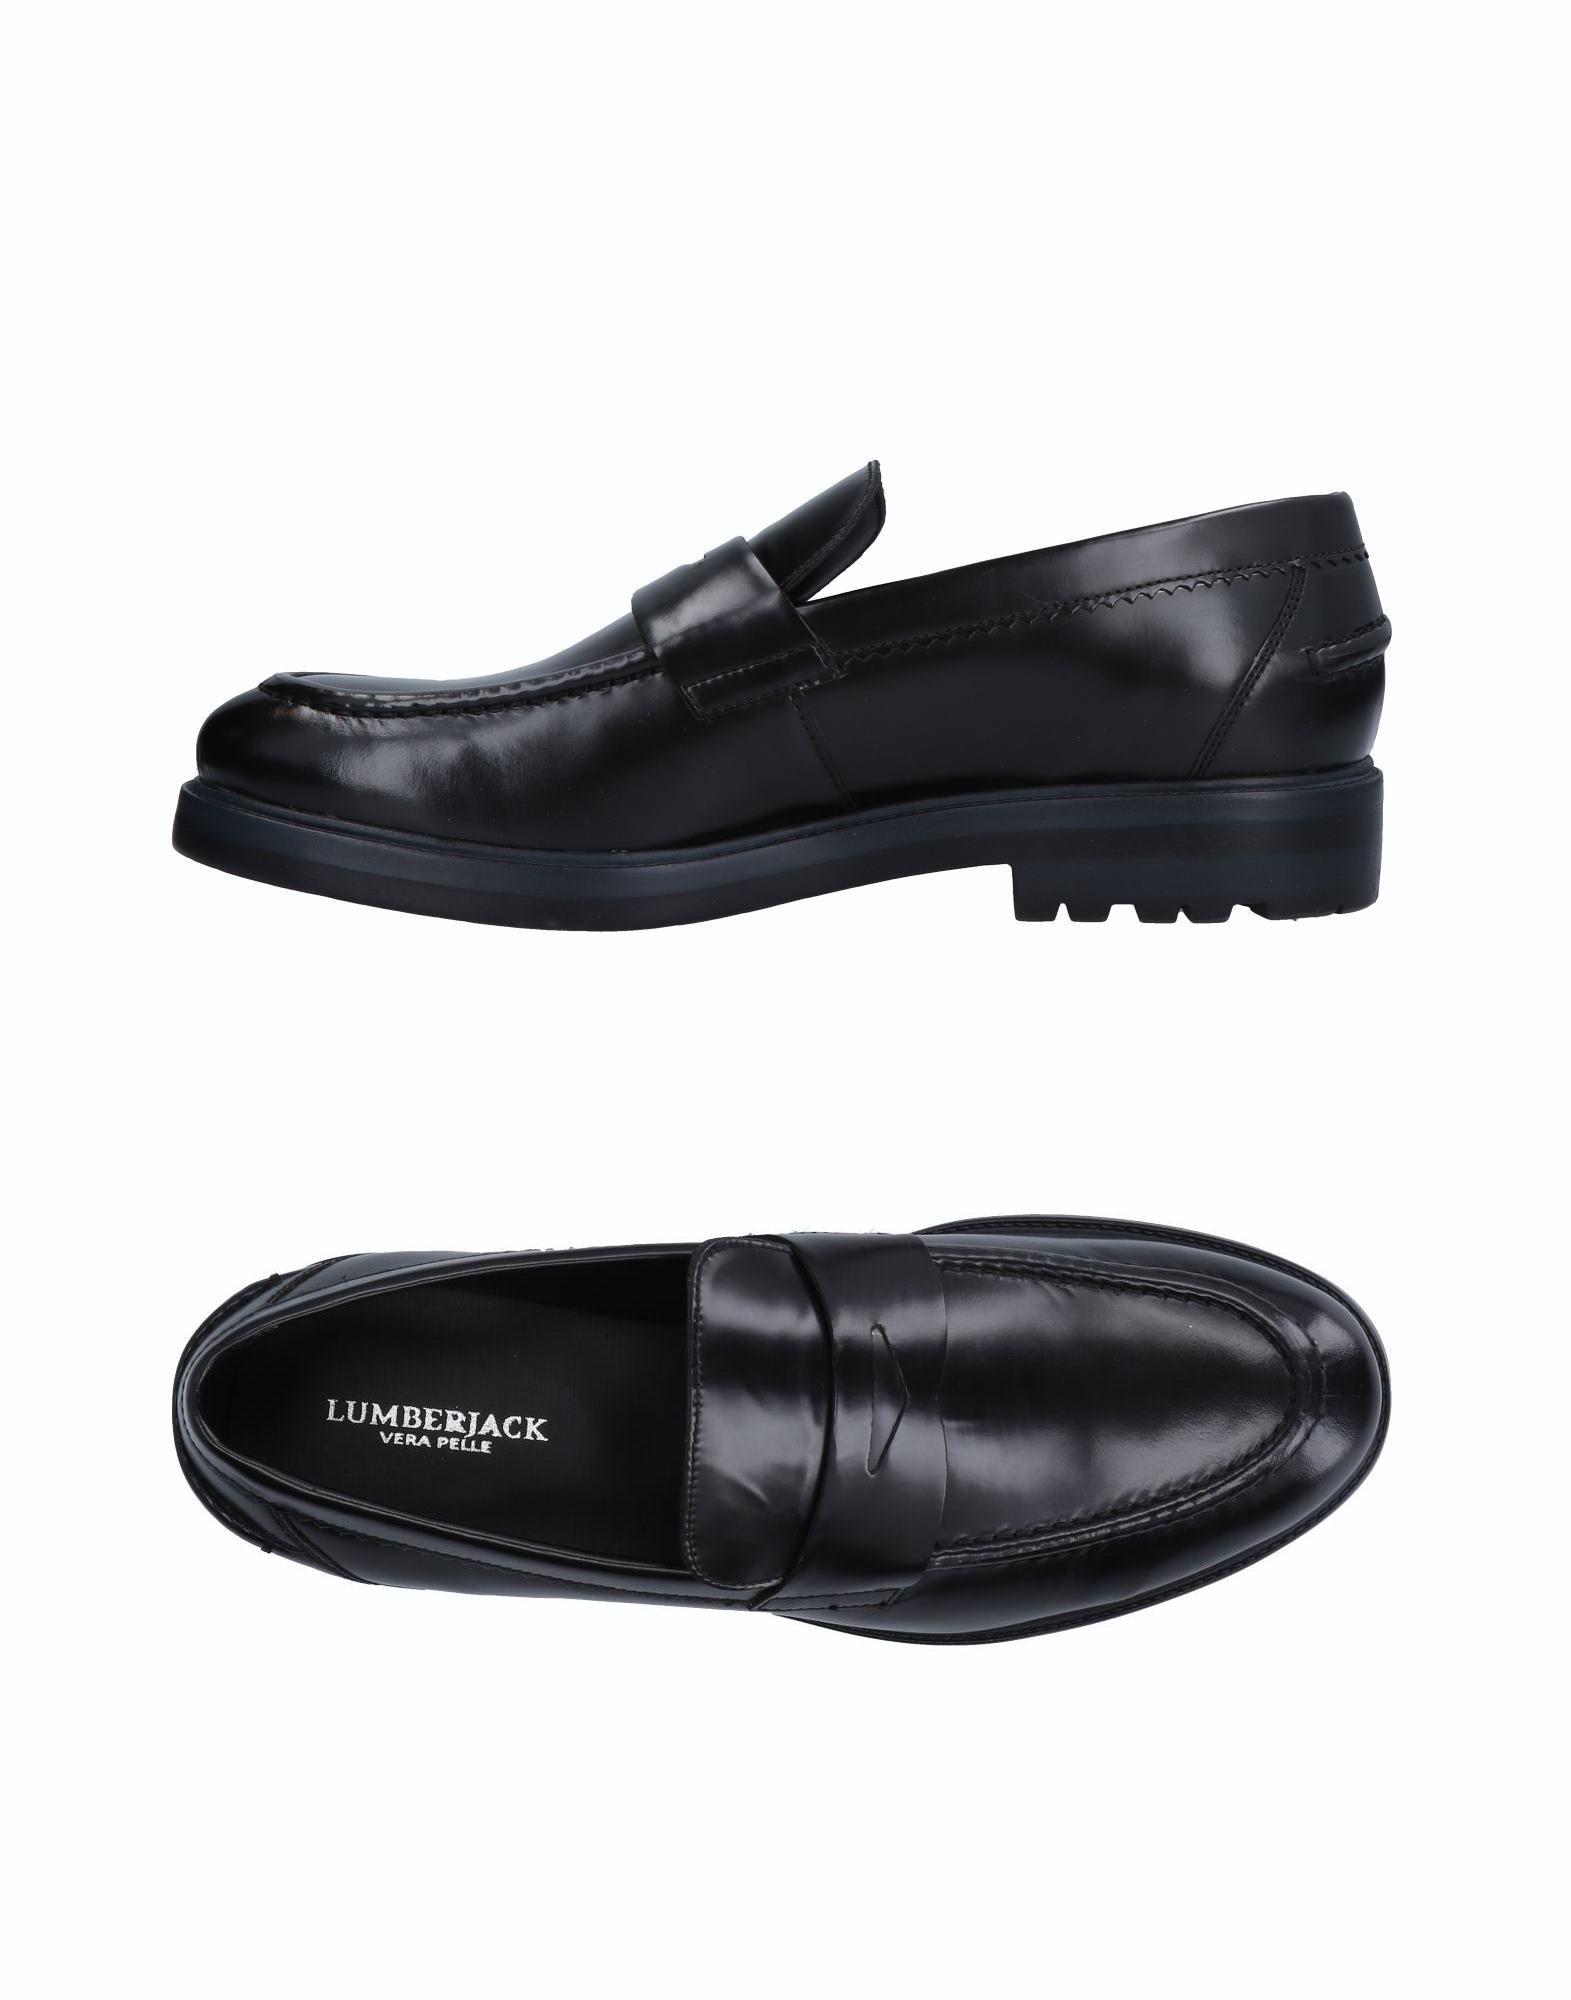 Lumberjack Mokassins Schuhe Herren  11514731PK Heiße Schuhe Mokassins 6a7e1c